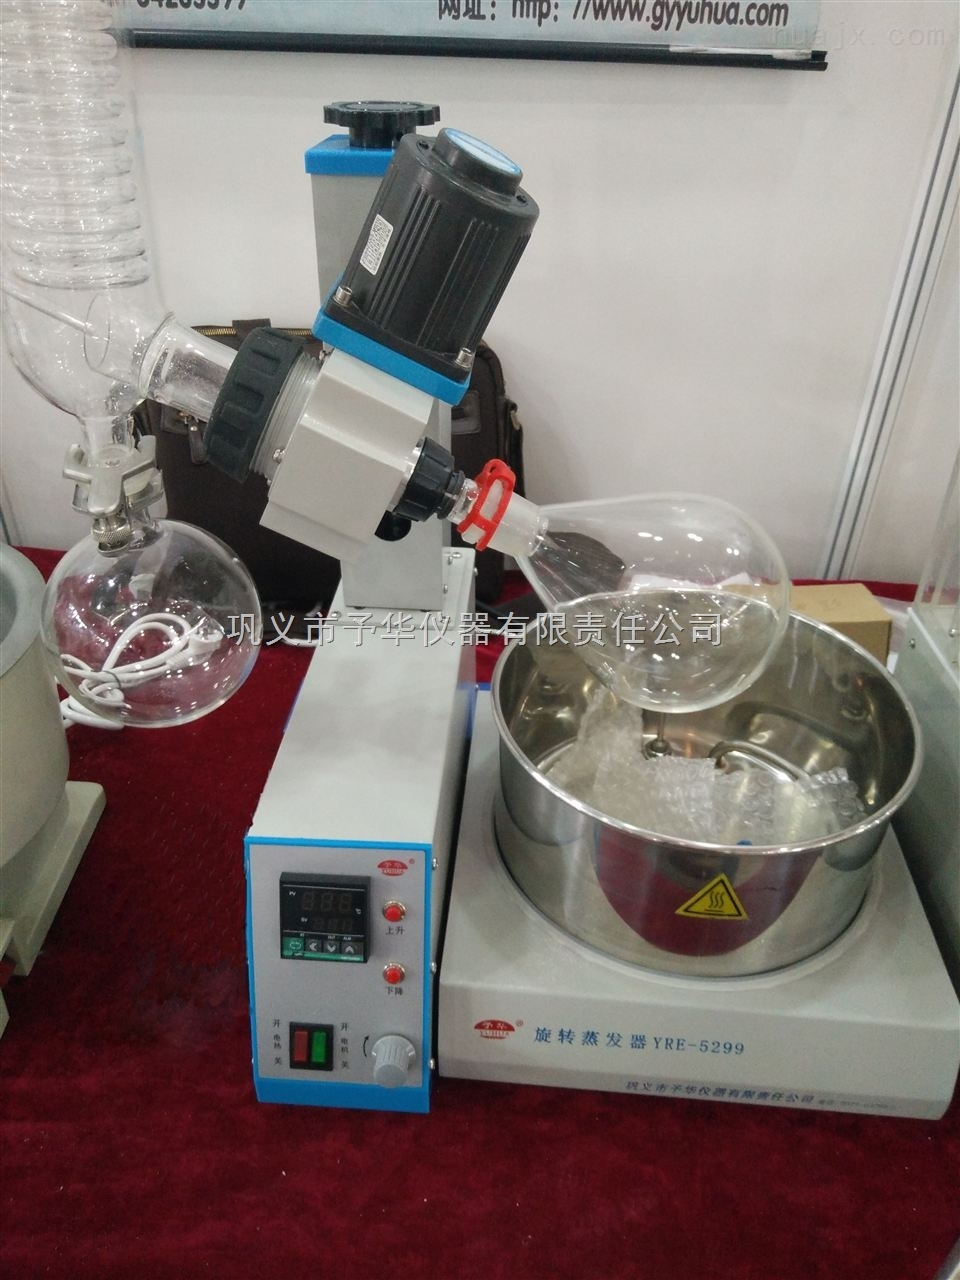 YRE-5299-小型旋转蒸发仪产品性能稳定,质优价低,厂家直销!